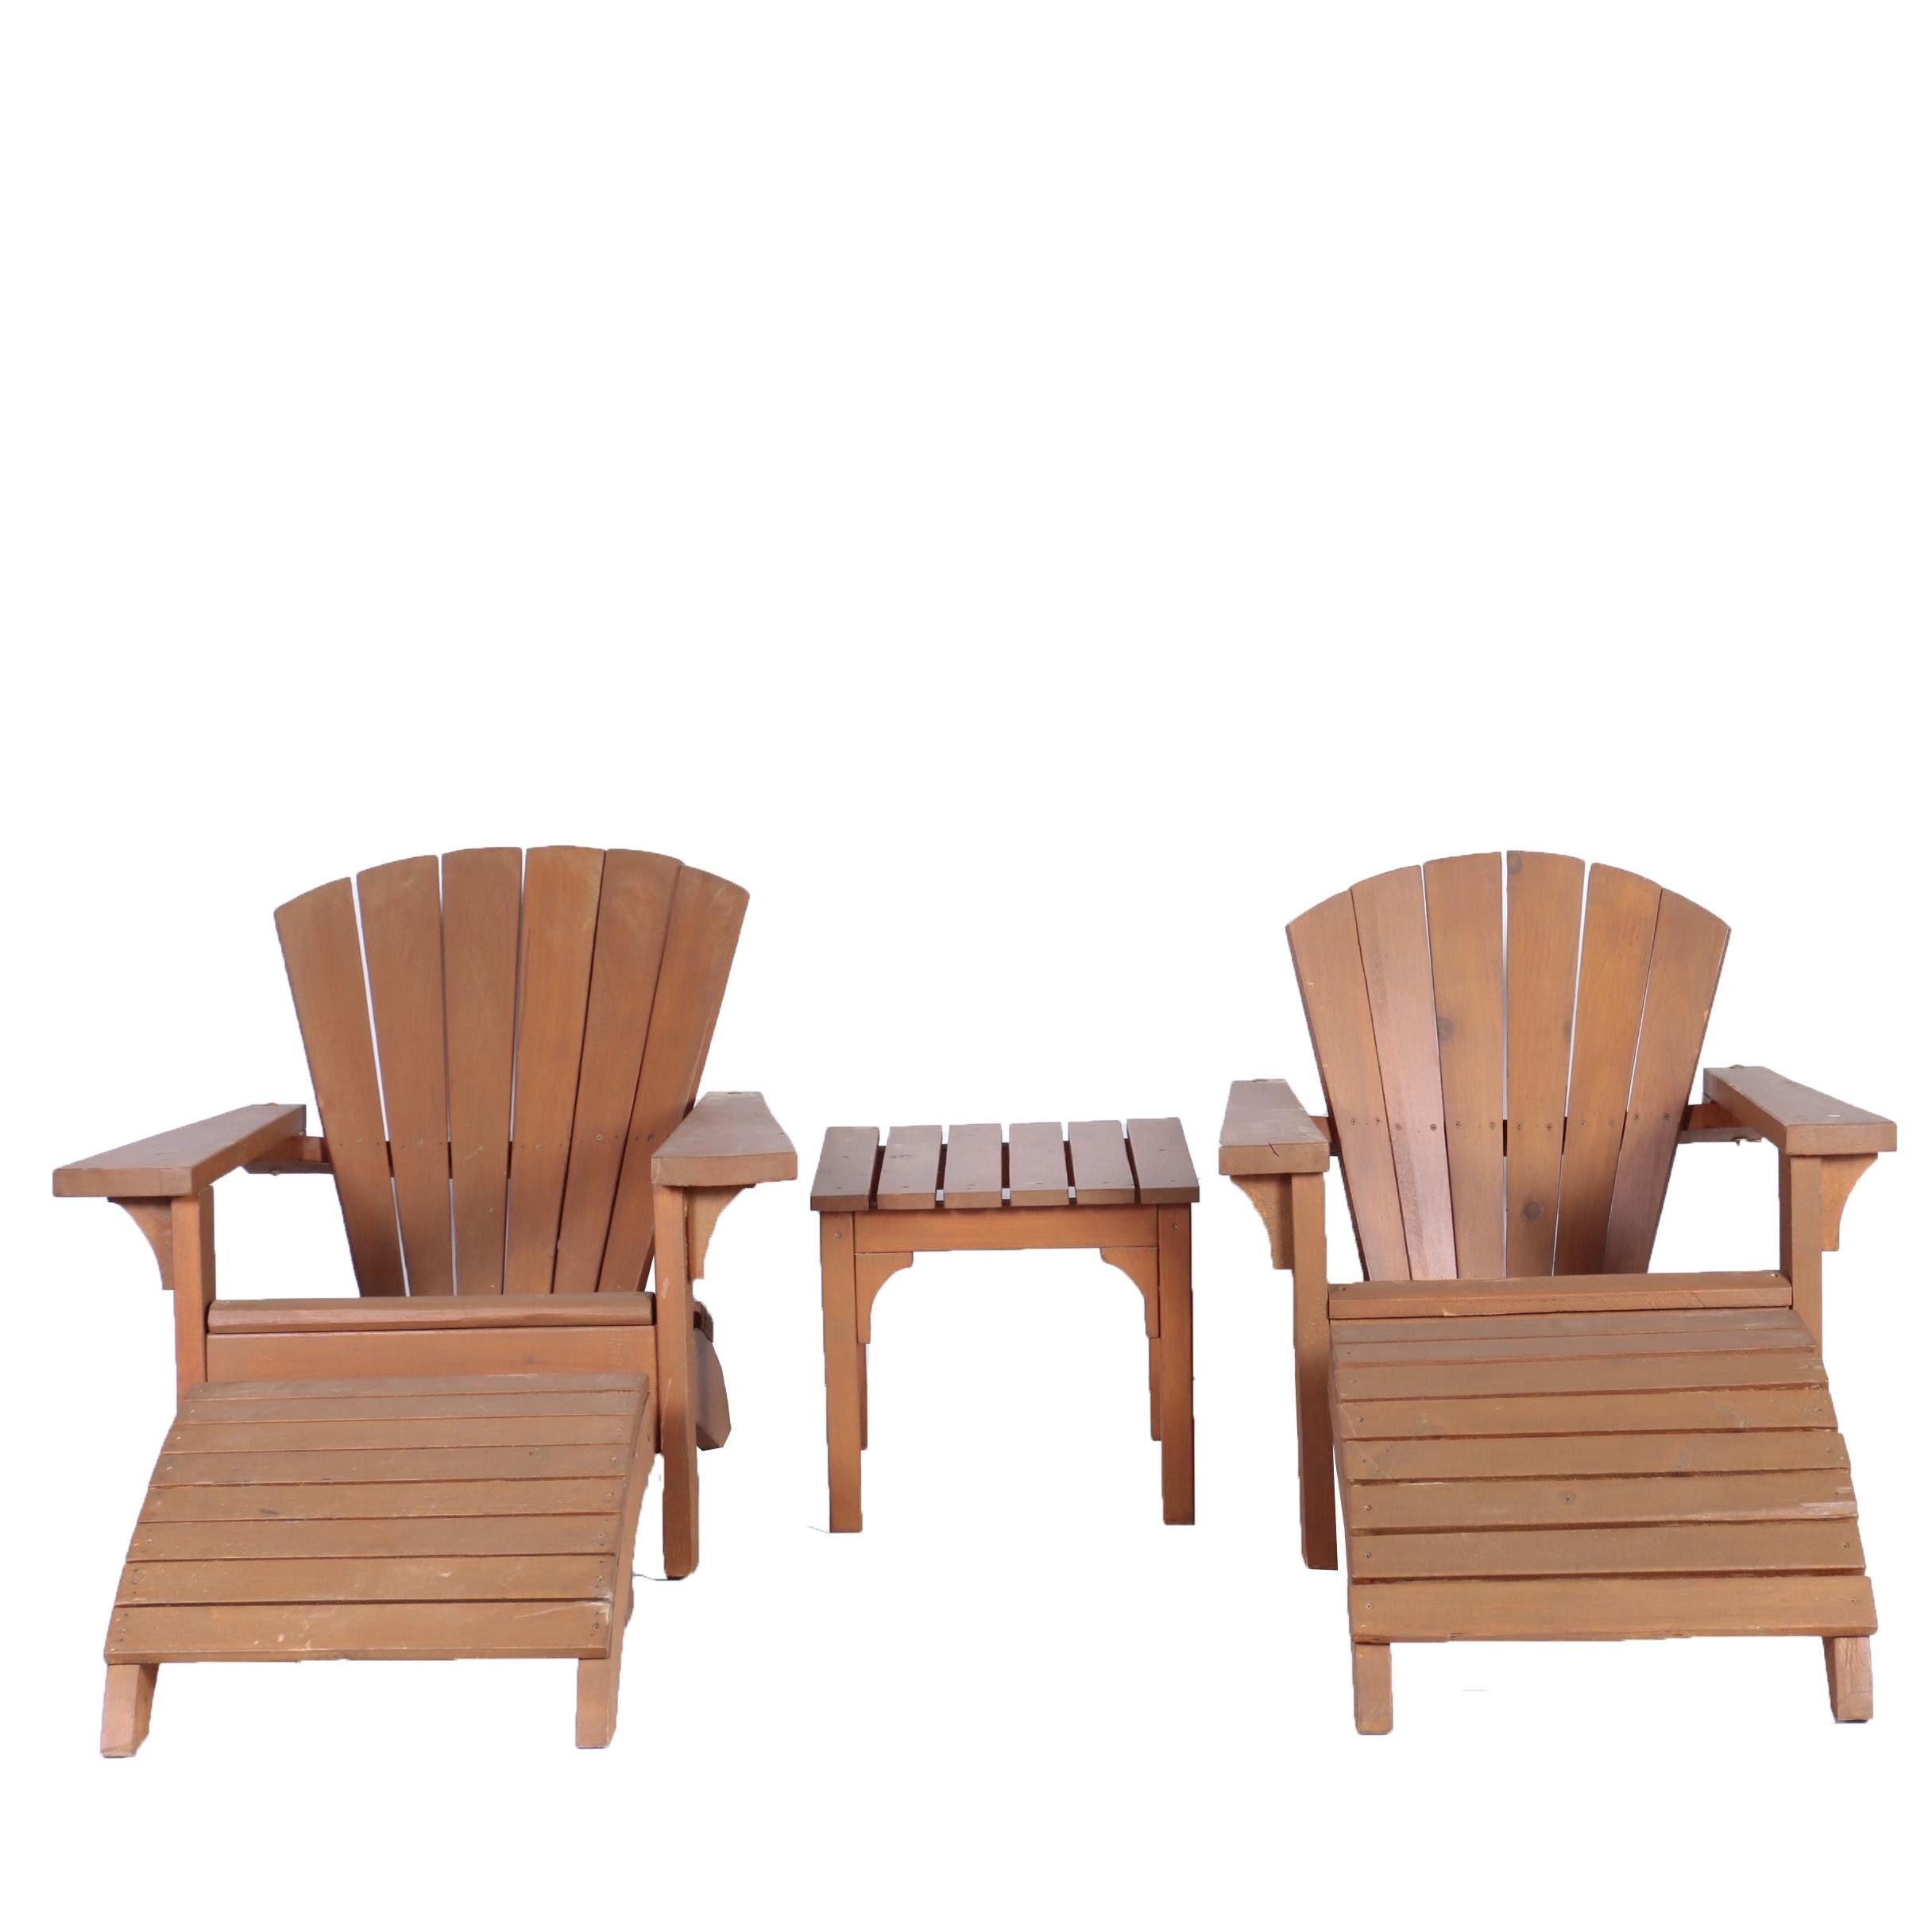 Vintage Adirondack Style Five-Piece Patio Furniture Set